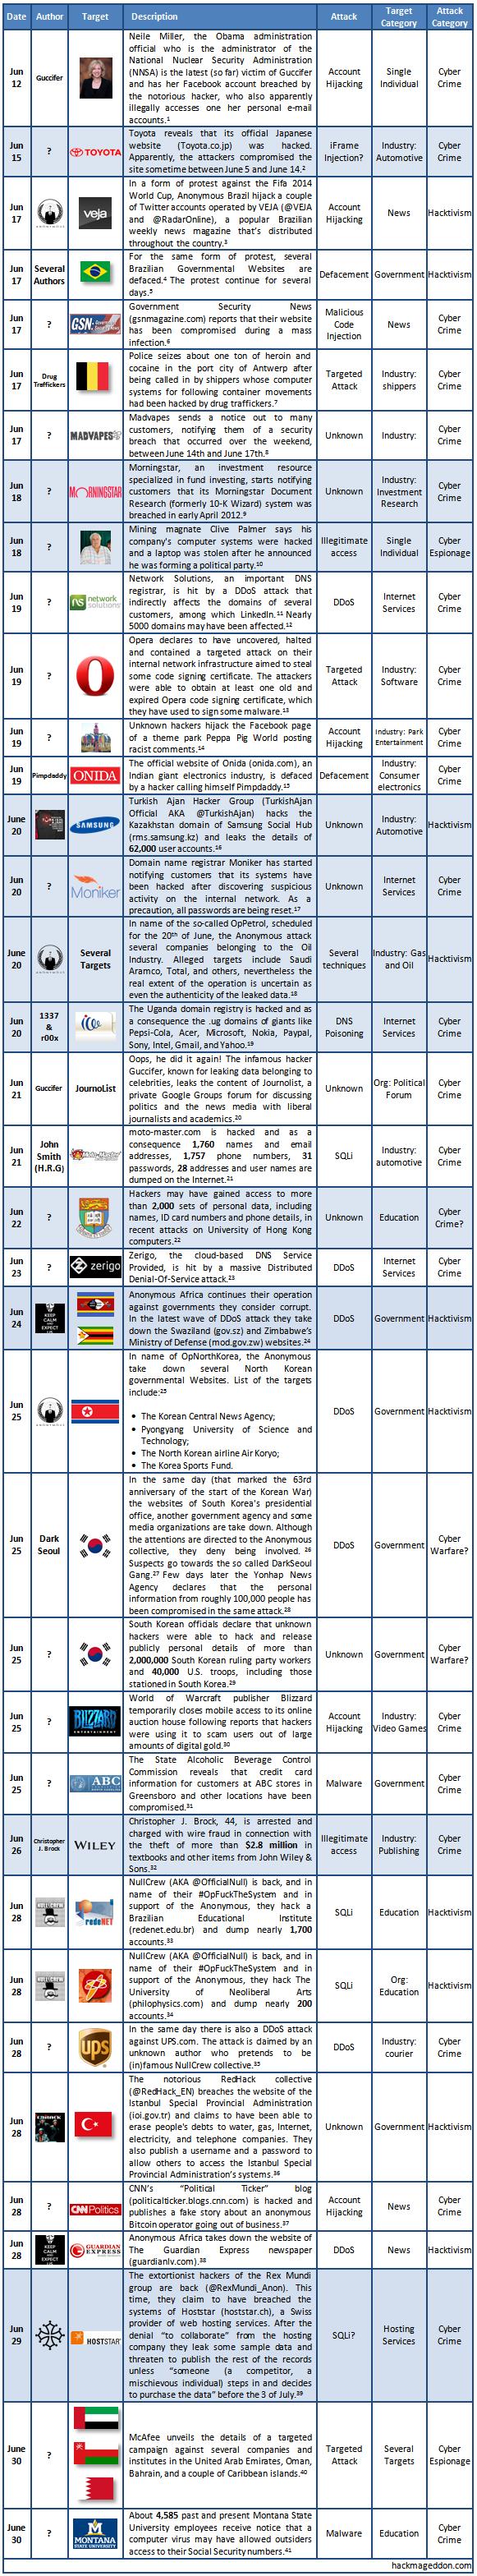 16-31 June 2013 Cyber Atacks Timeline